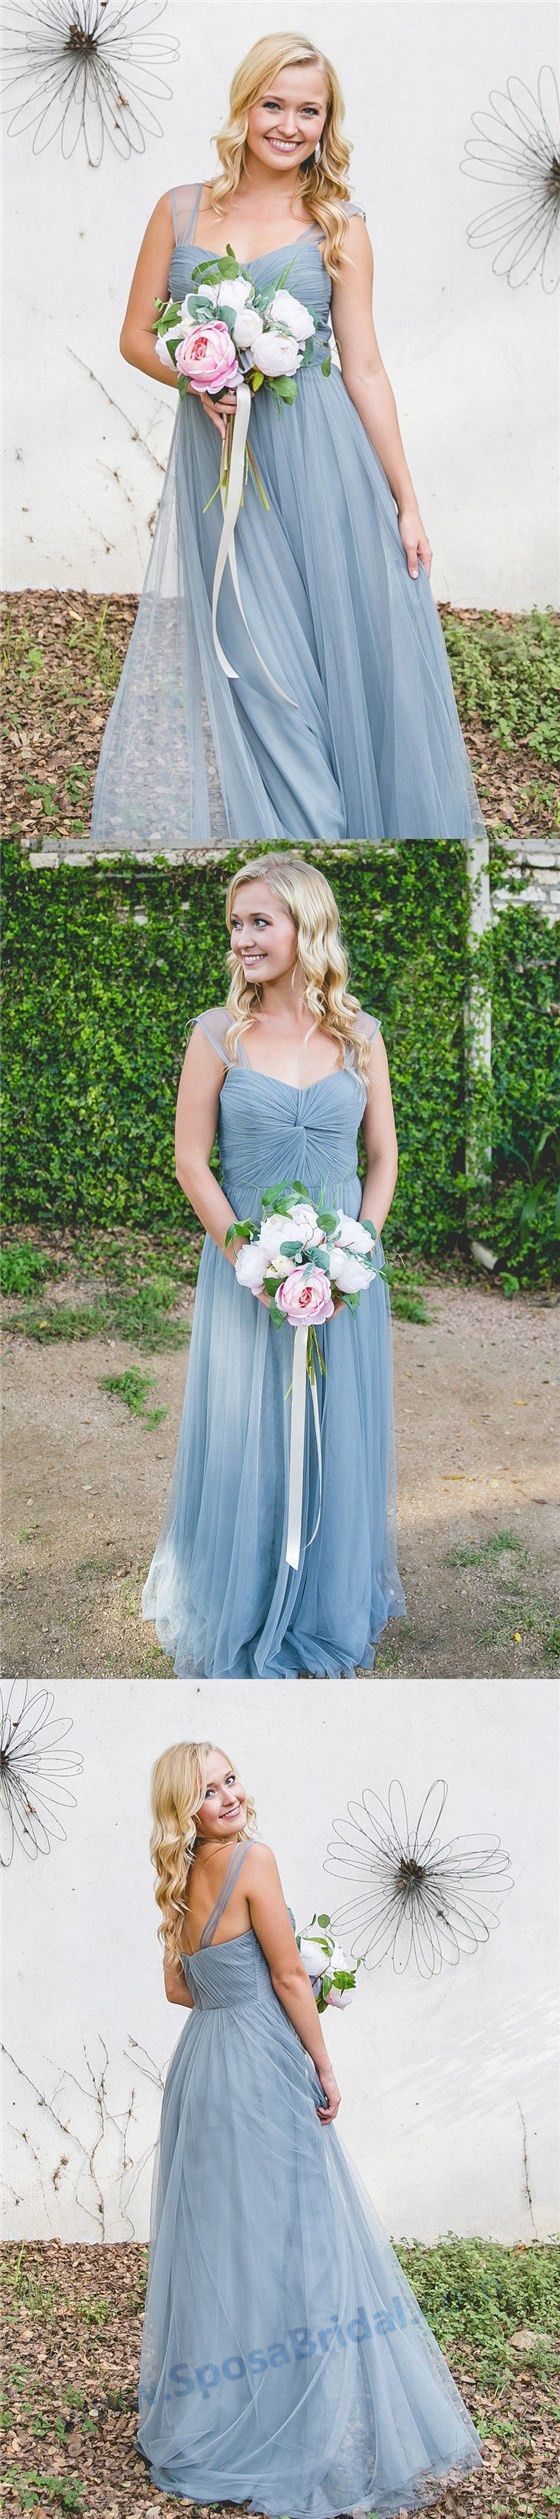 best bridesmaid dresses images on pinterest bridal dresses